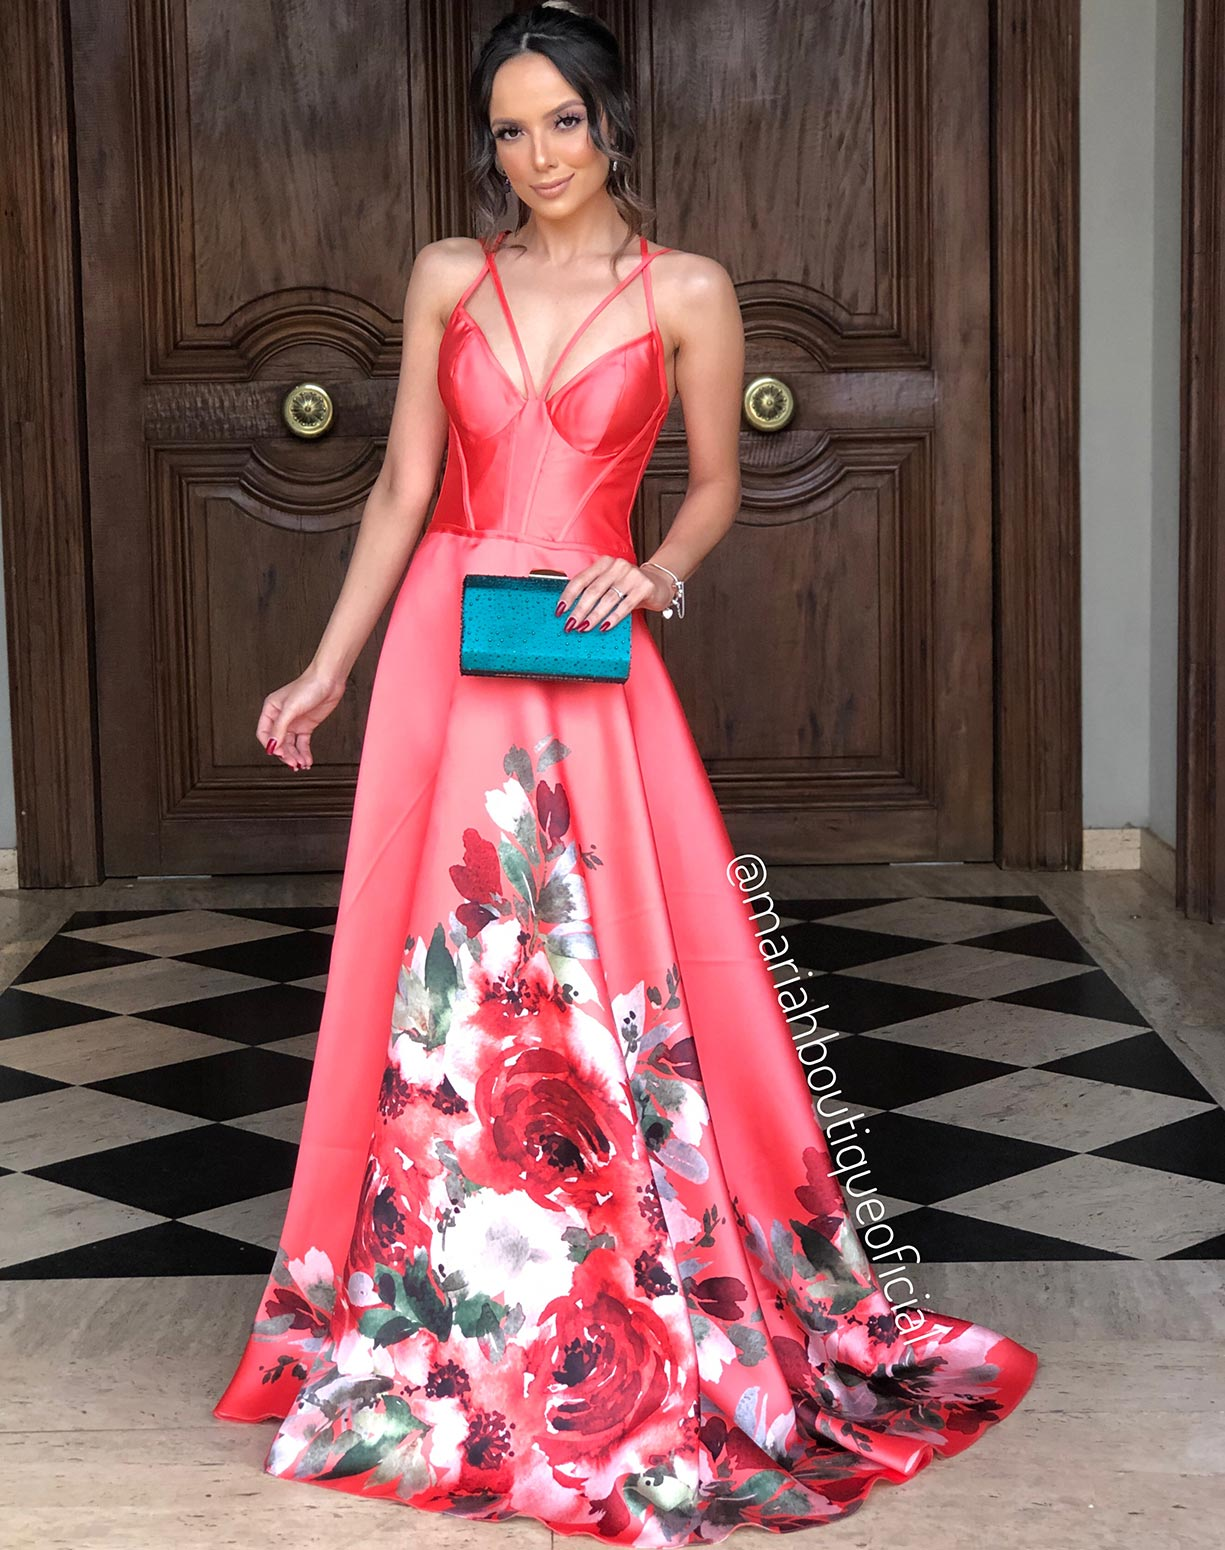 Vestido Coral em Zibeline com Barrado Floral